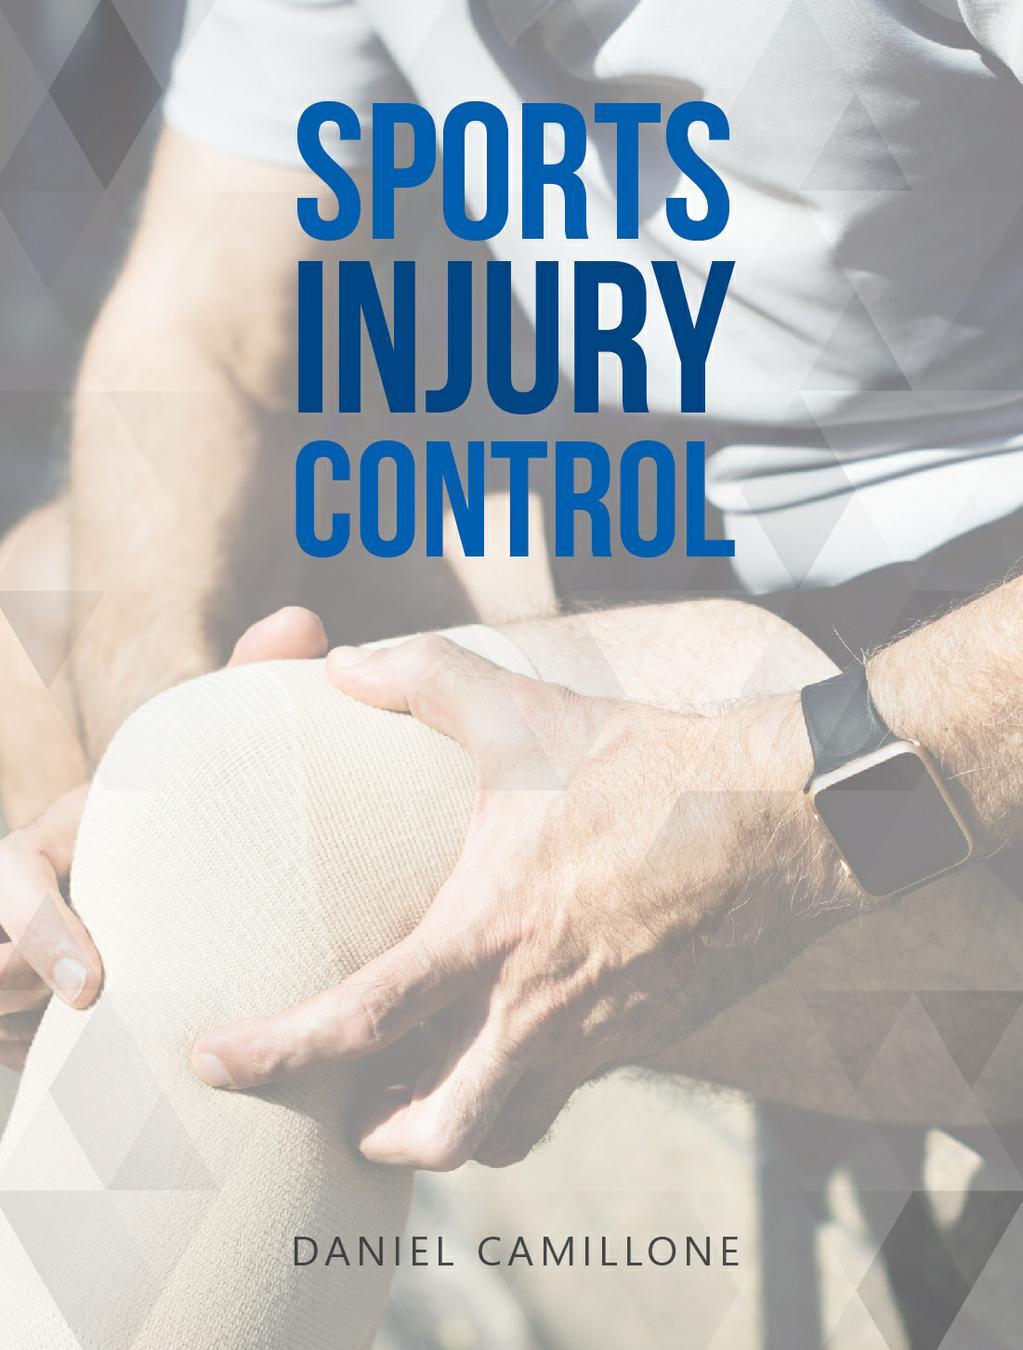 Sports Injury Control